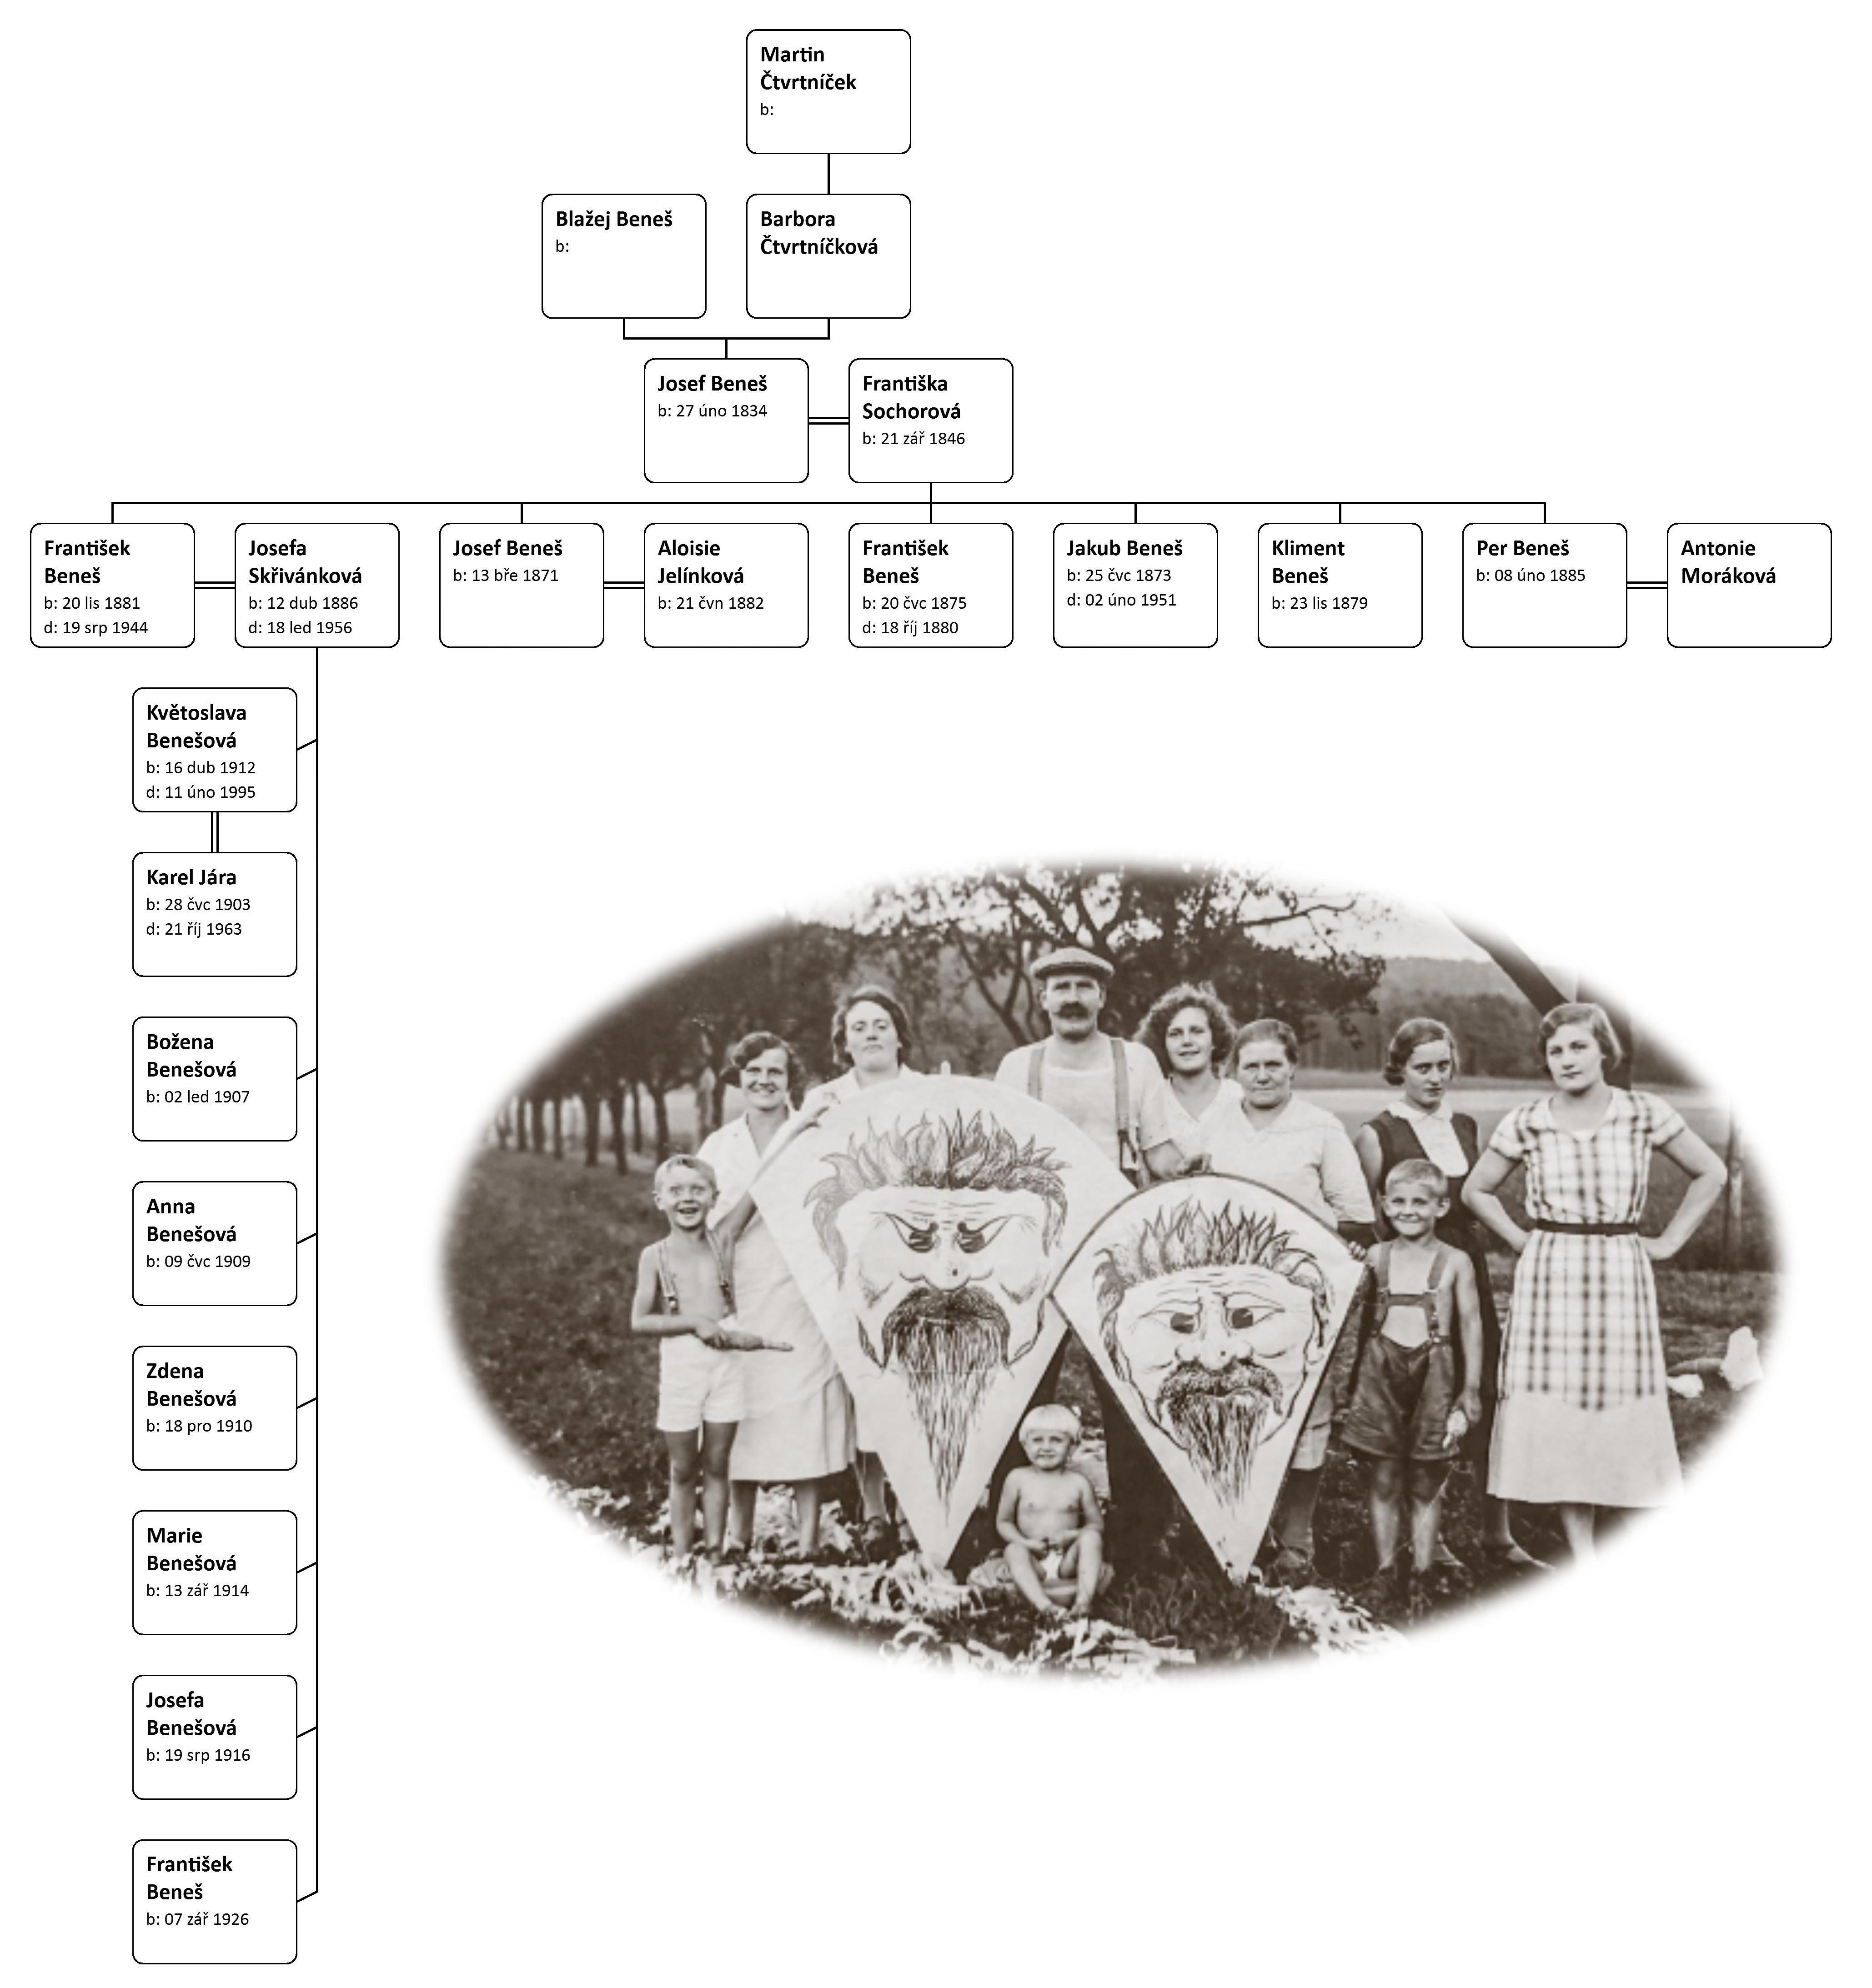 Hourglass Chart for Josef Beneš